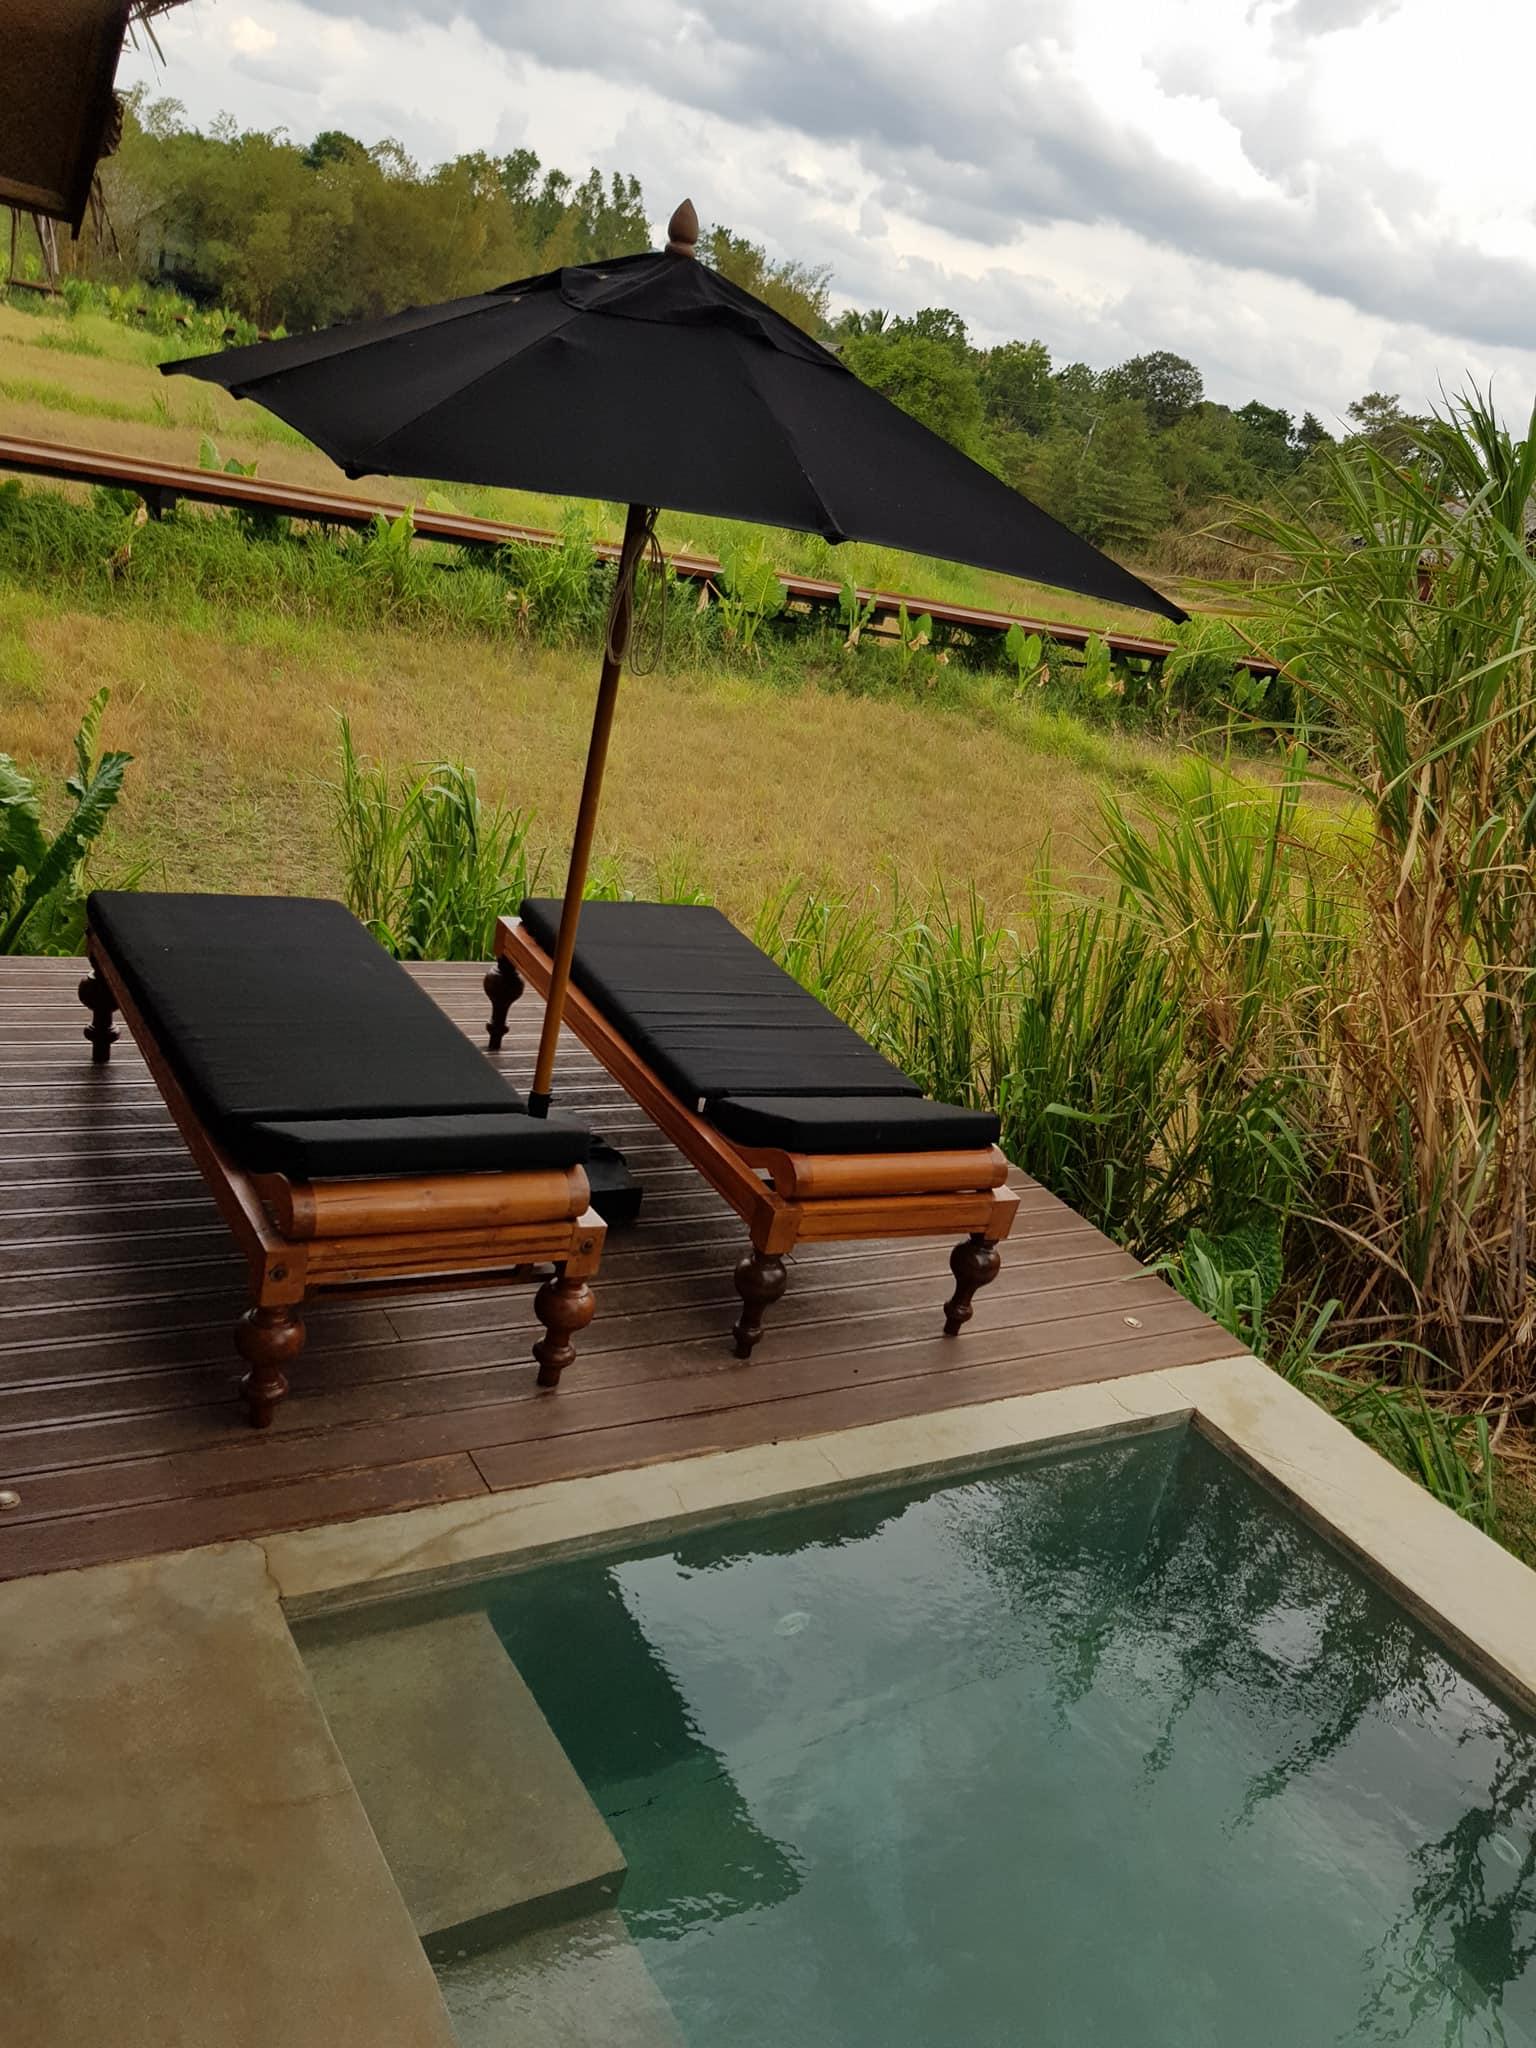 invite-to-paradise-sri-lanka-maldives-holiday-honeymoon-specialists-customer-guest-feedback-zane-lisa-butcher-jetwing-vil-uyana-hotel-sigiriya-cultural-triangle-paddy-dwelling-pool.jpg